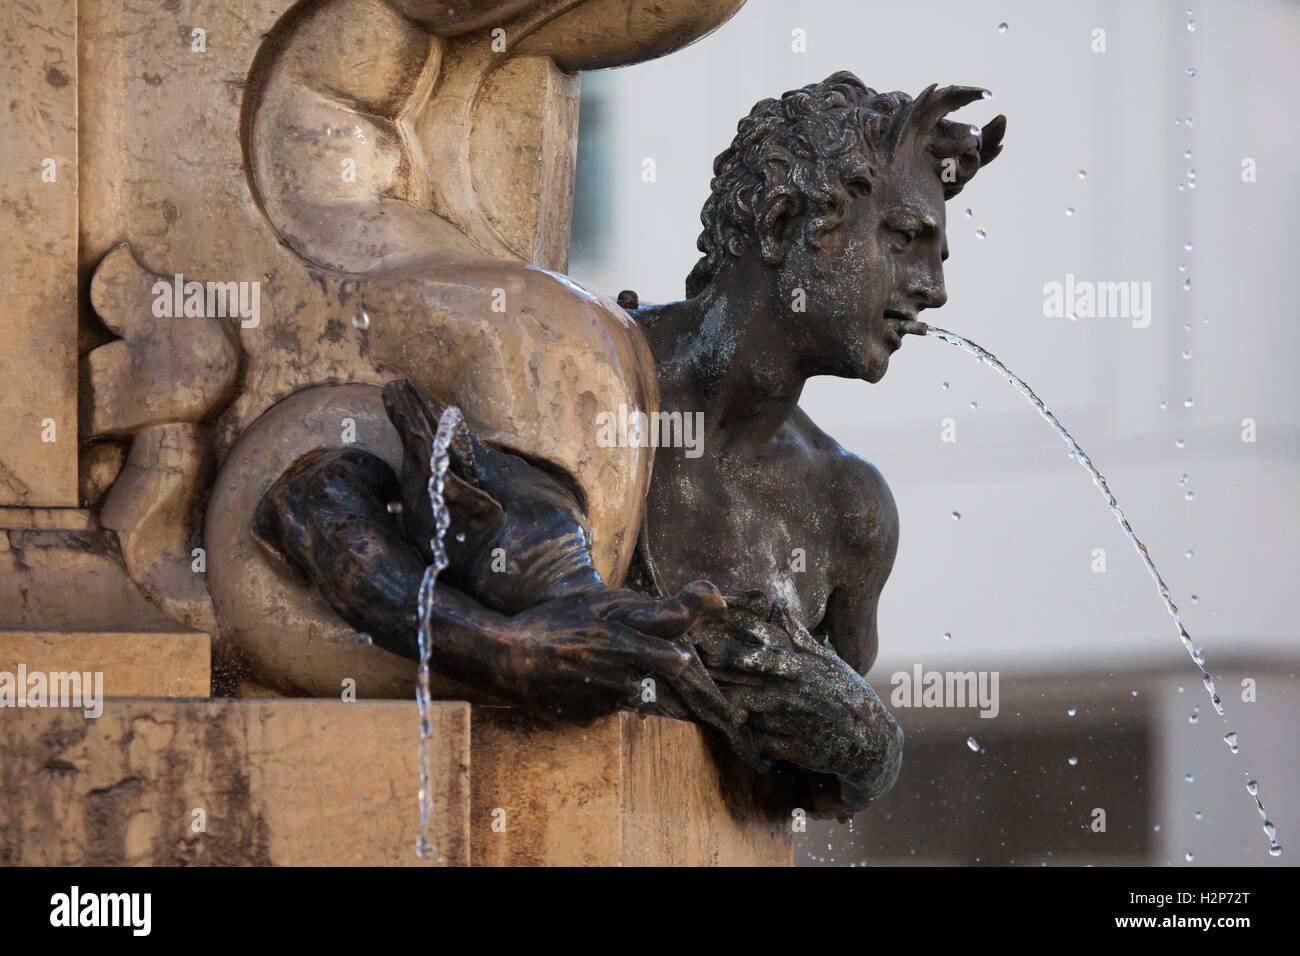 Triton. Bronze statue by Dutch mannerist sculptor Adriaen de Vries on the Hercules Fountain in Augsburg, Bavaria, - Stock Image